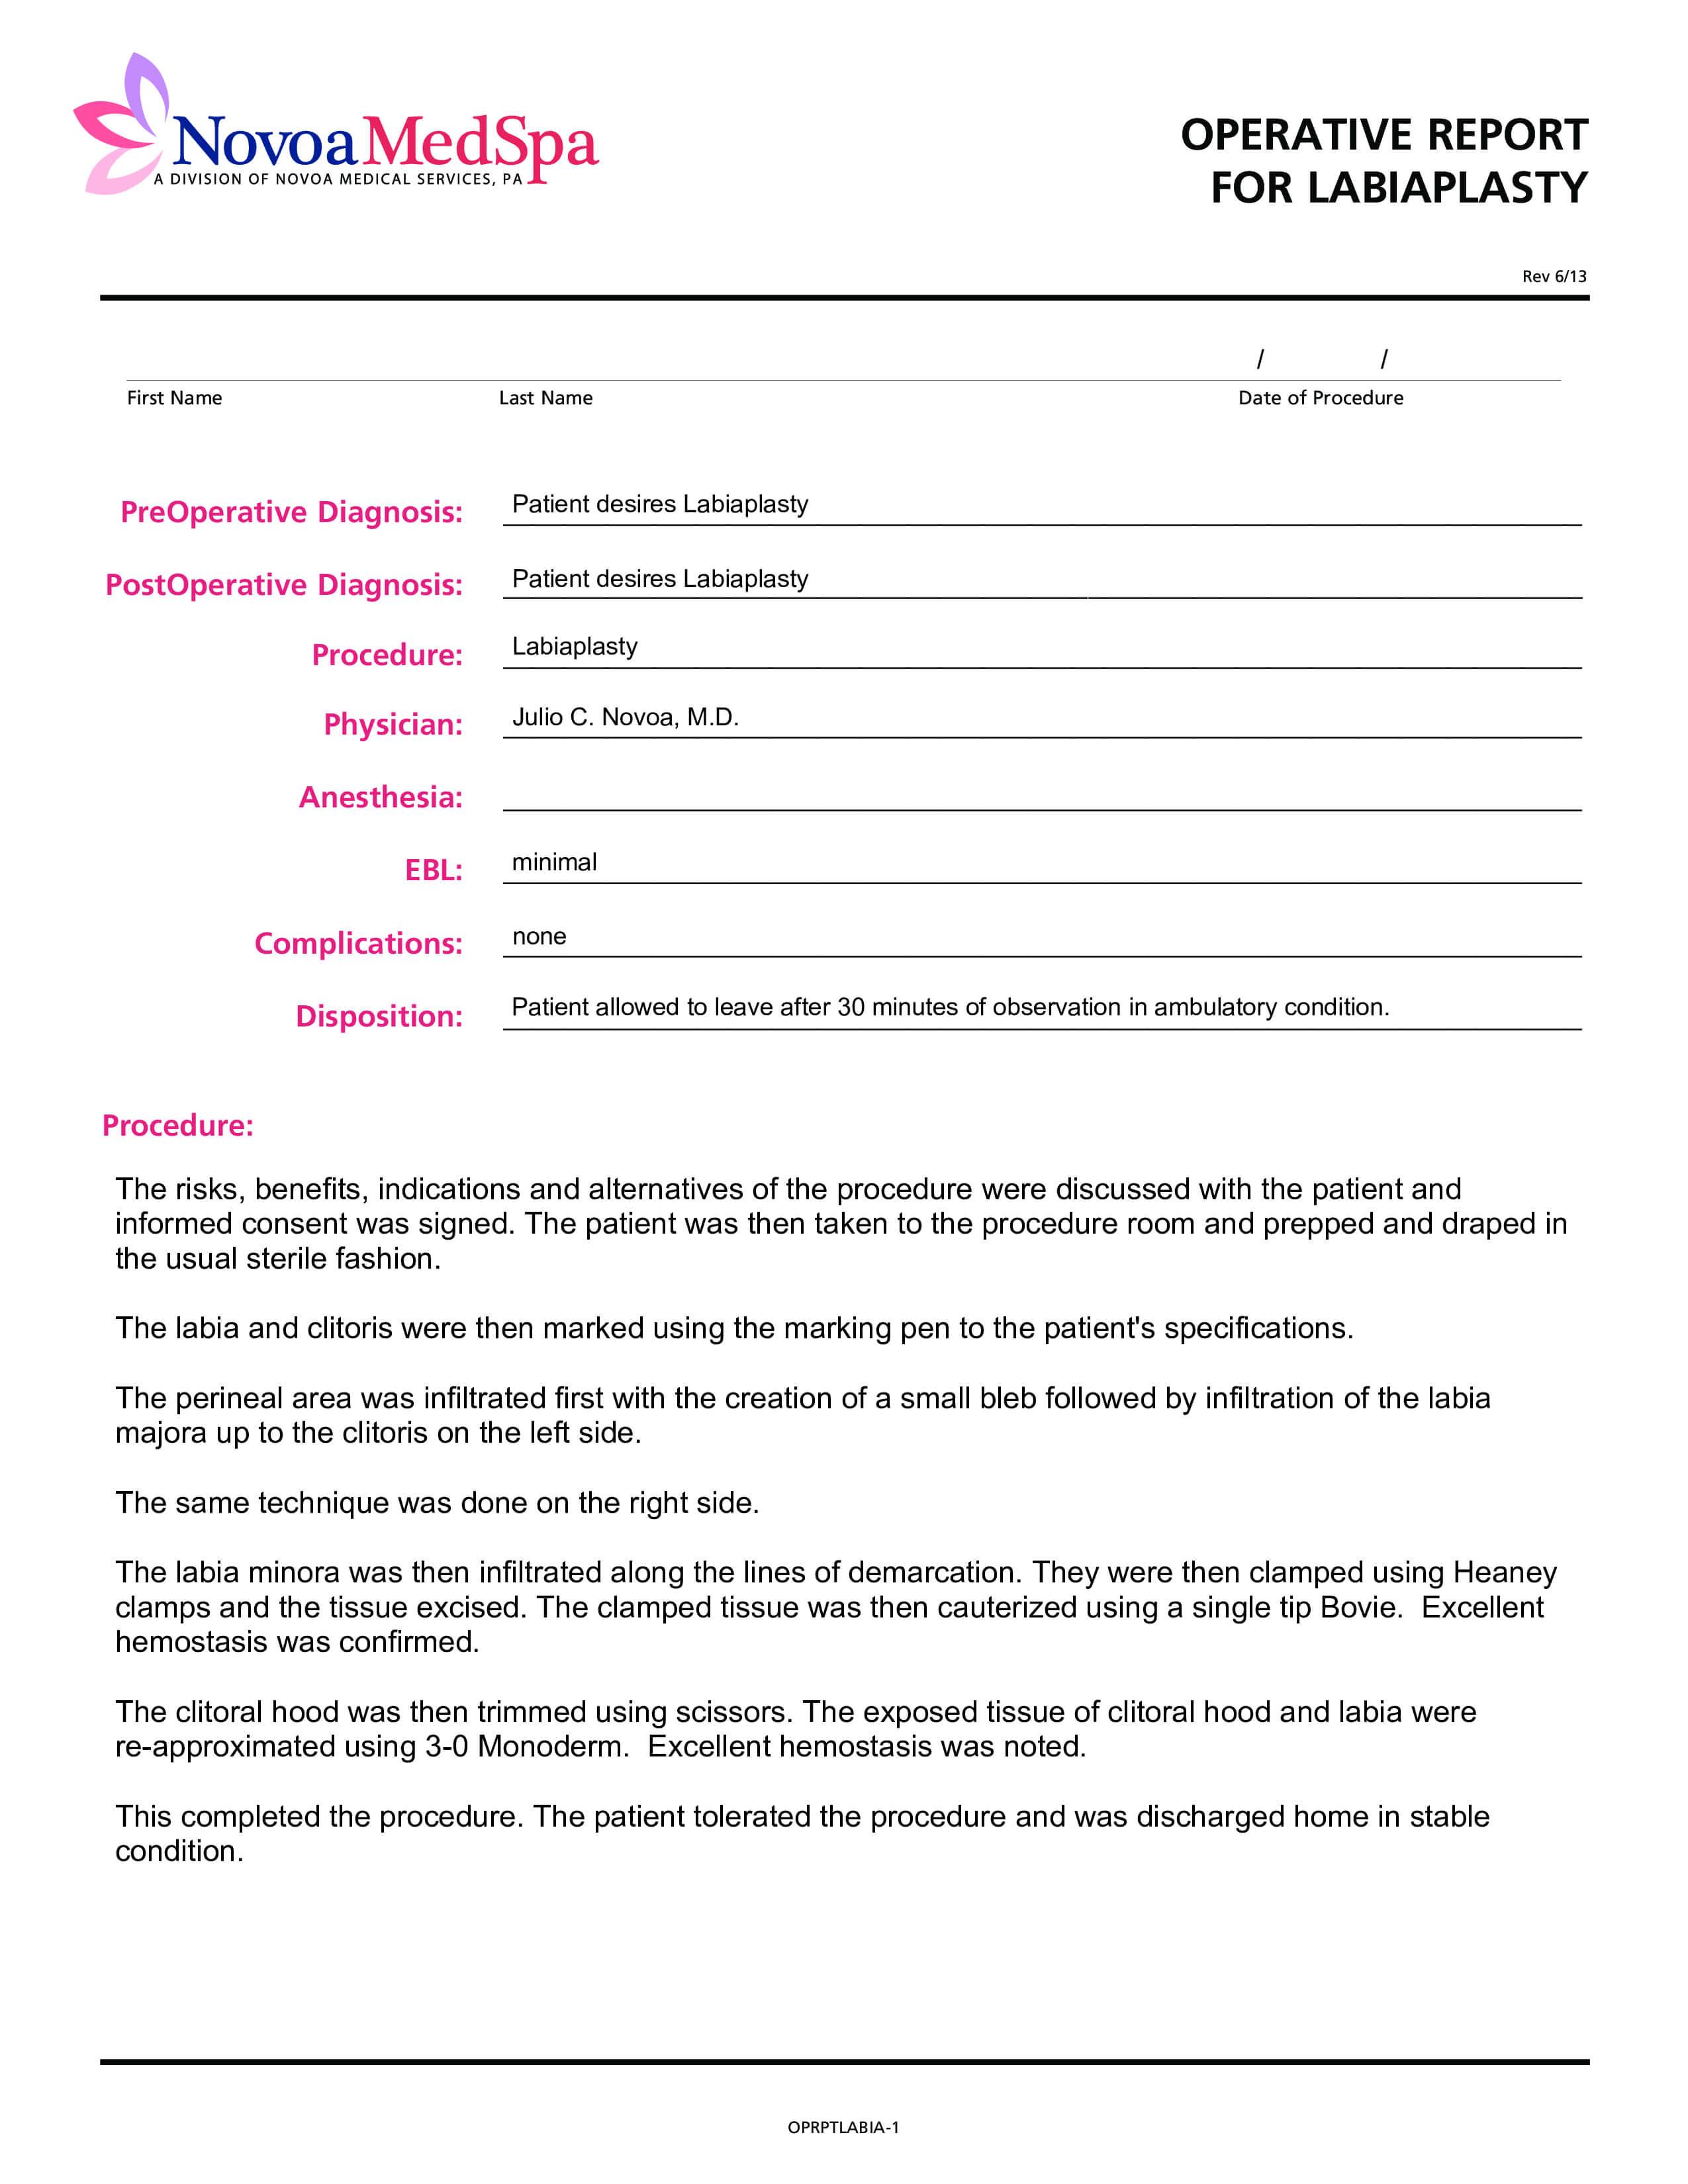 Operative Report   Templates At Allbusinesstemplates Pertaining To Operative Report Template